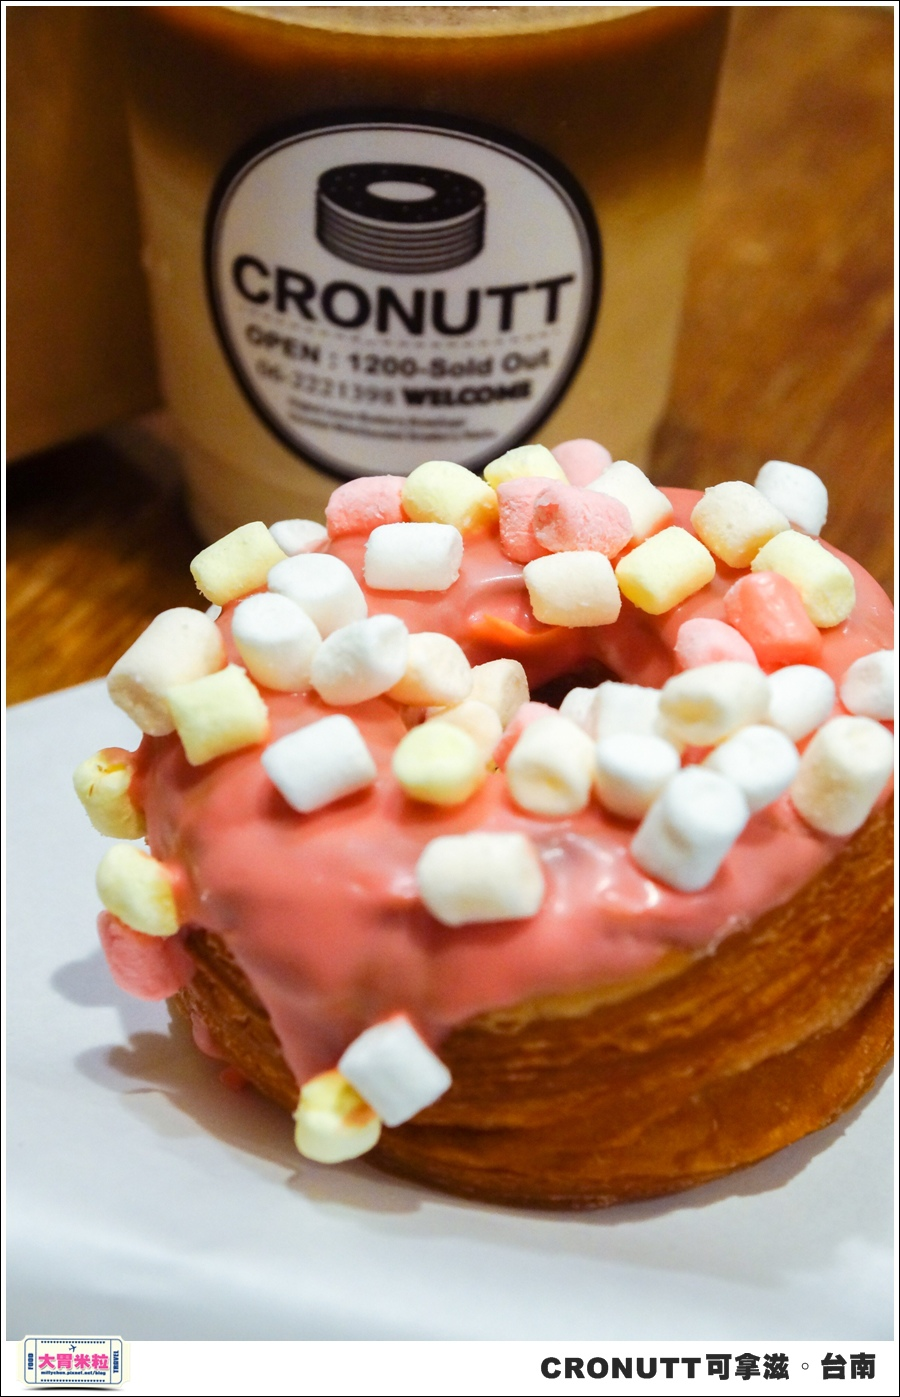 CRONUTT可拿滋台南店@紐約可頌甜甜圈@大胃米粒0019.jpg